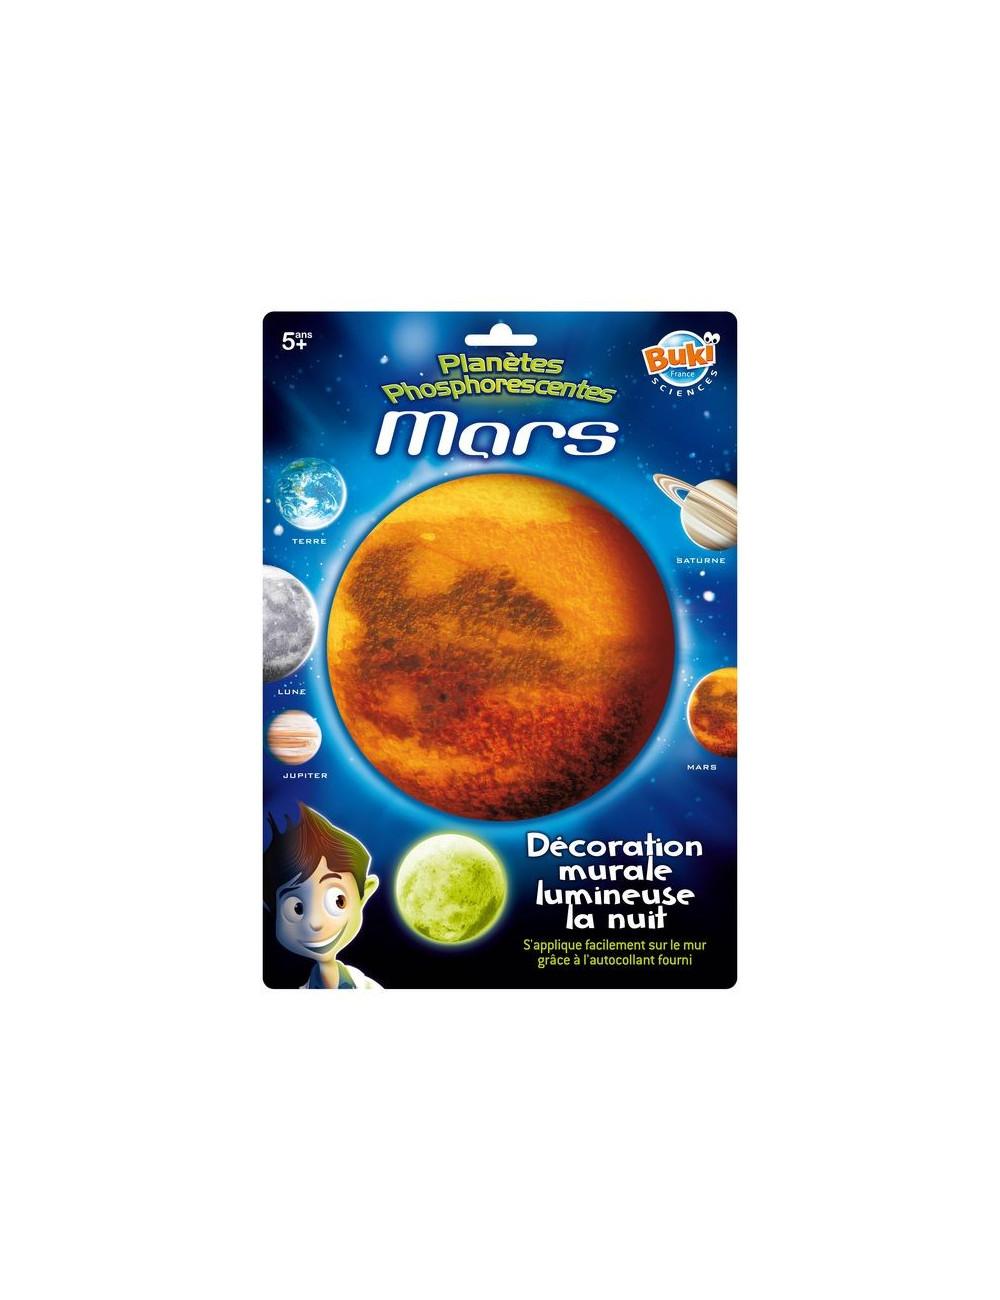 Mars phosphorescente